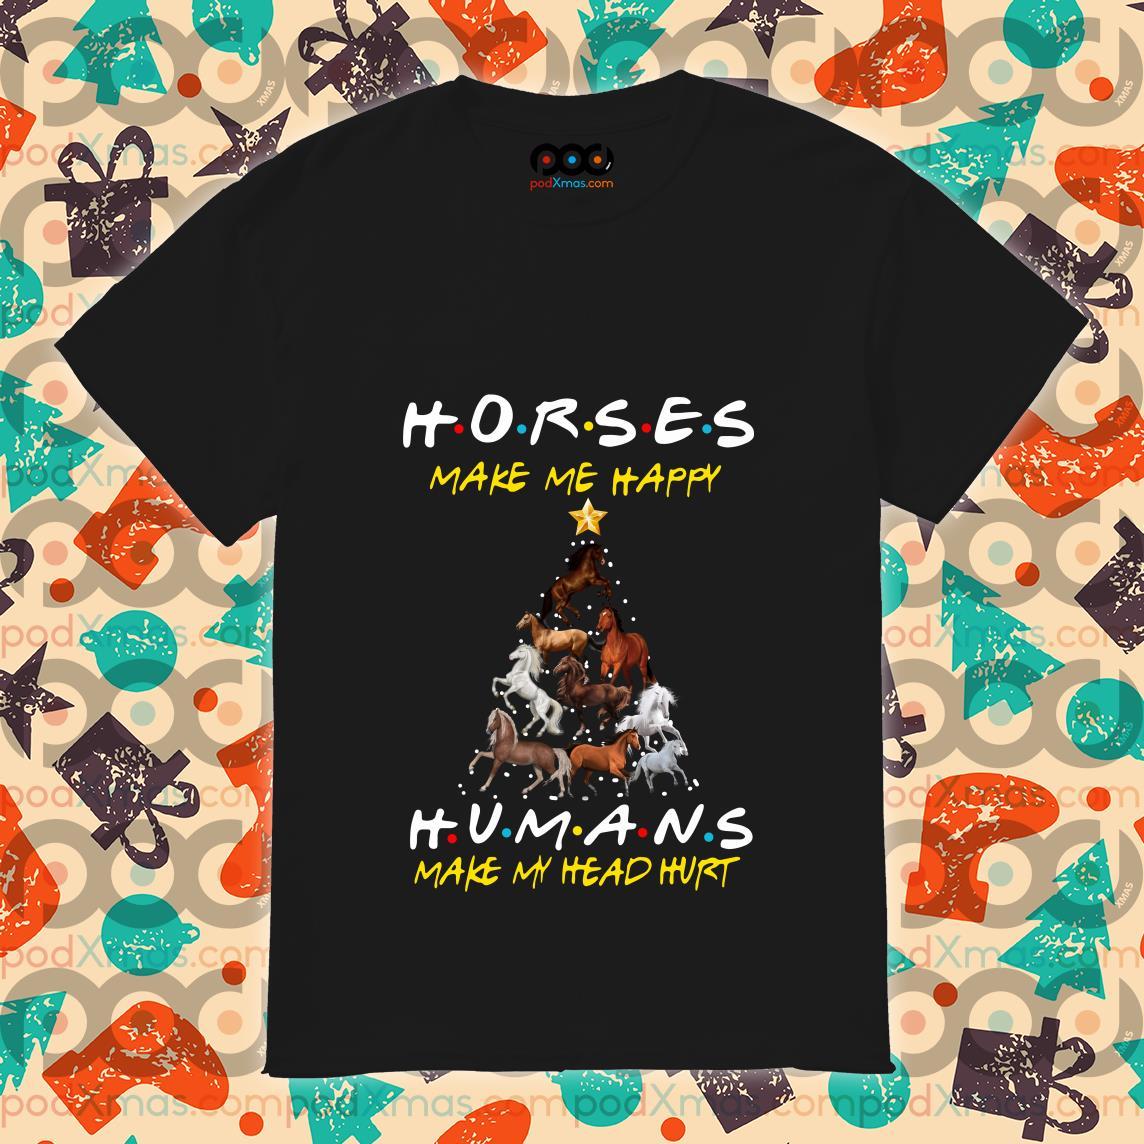 Horses make me happy humans make my head hurt Christmas shirt